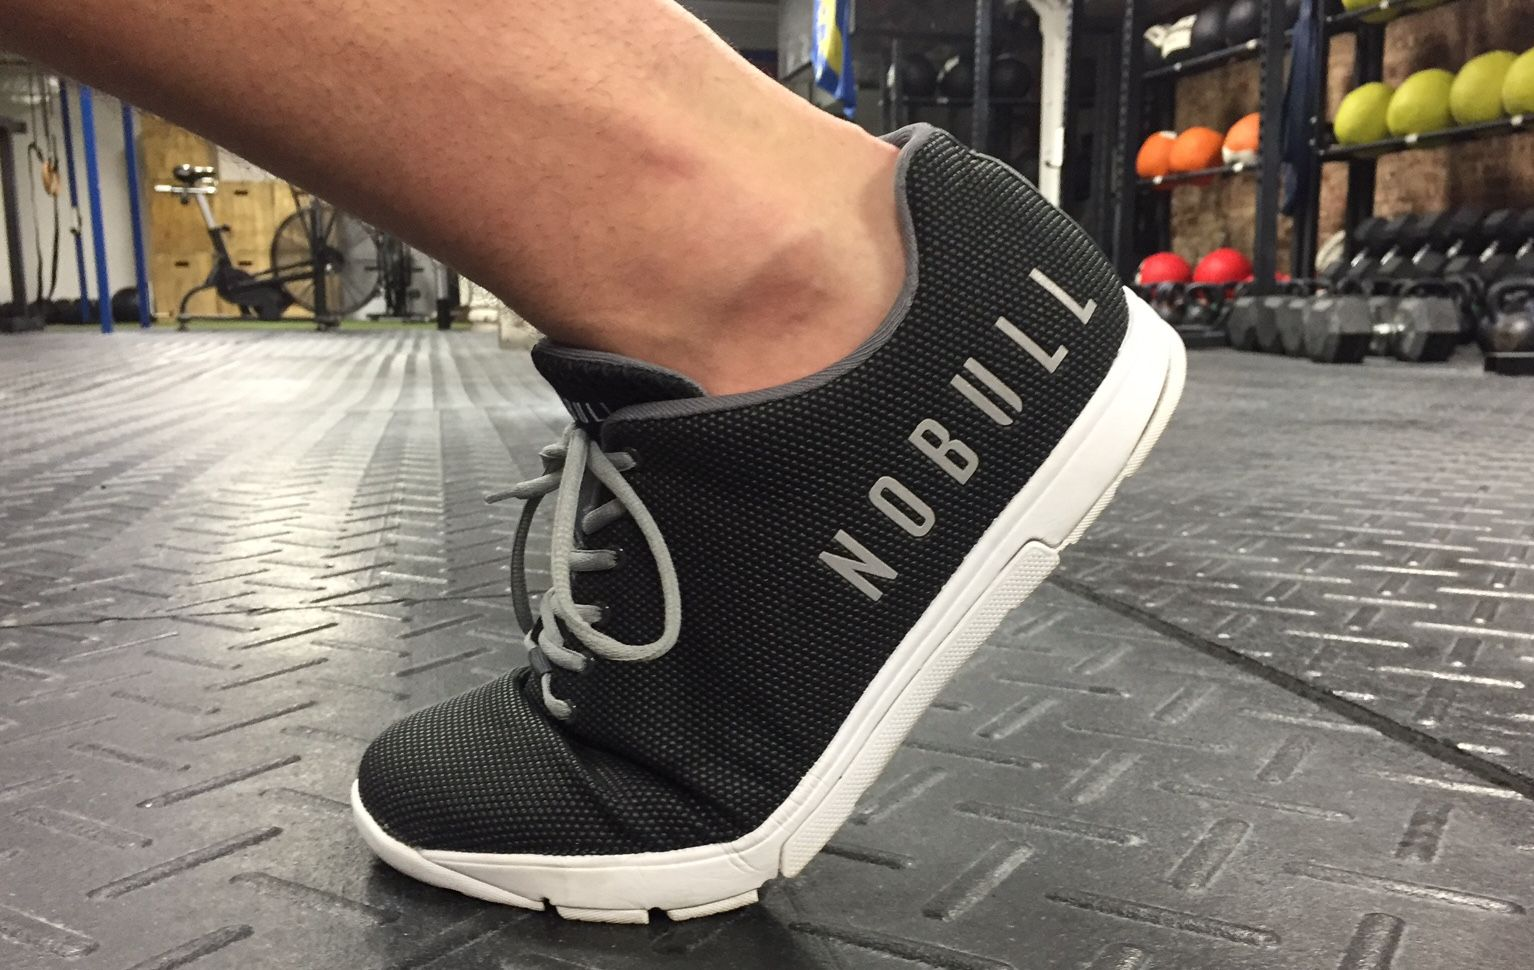 Crossfit shoes, Crossfit clothes